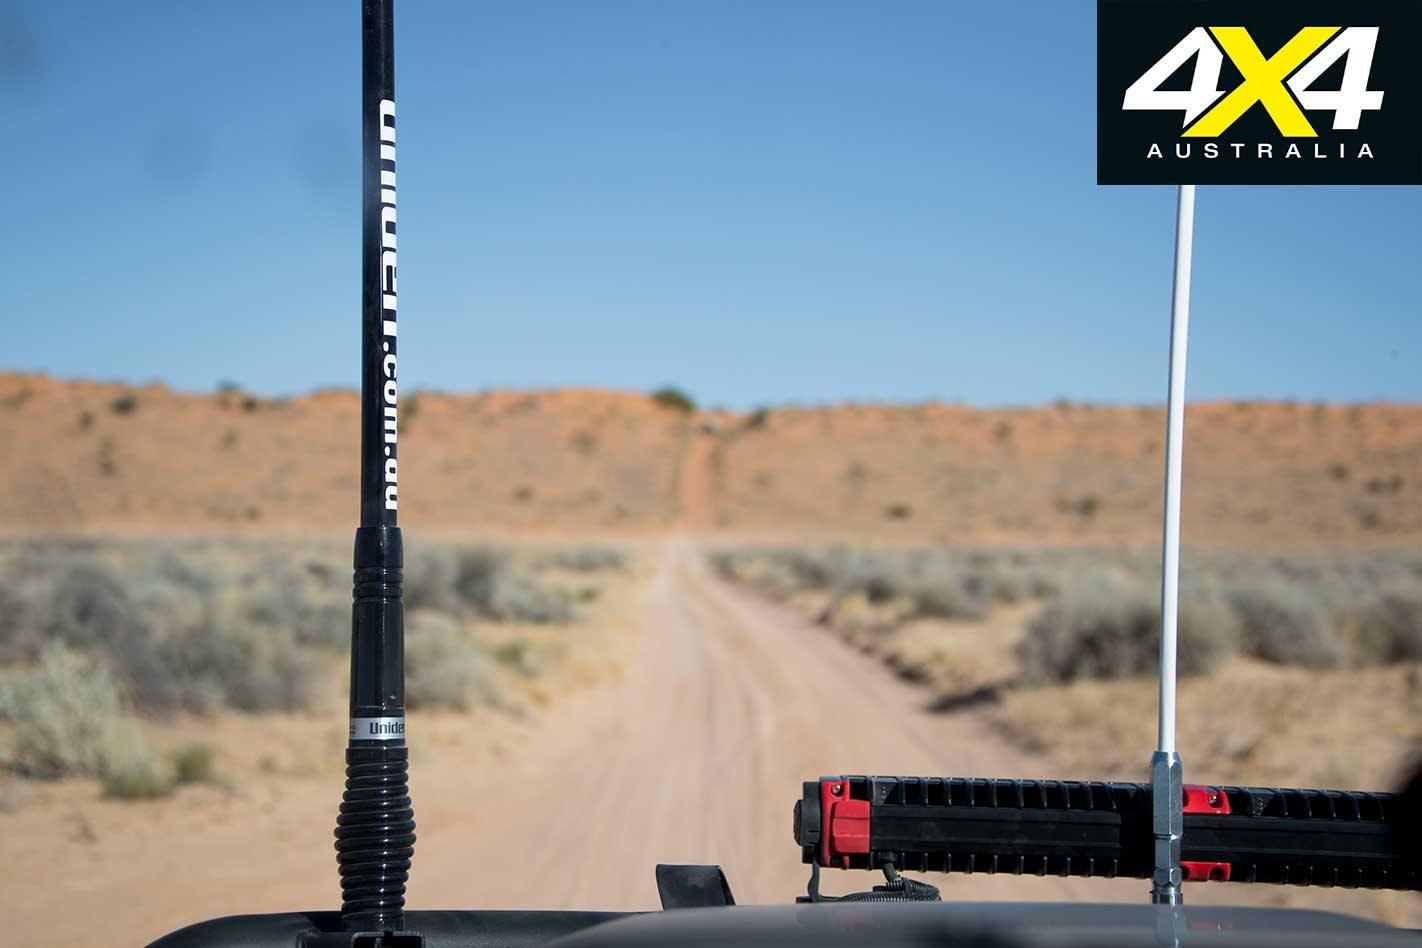 UHF Radios   4x4 Australia Buyers' Guide